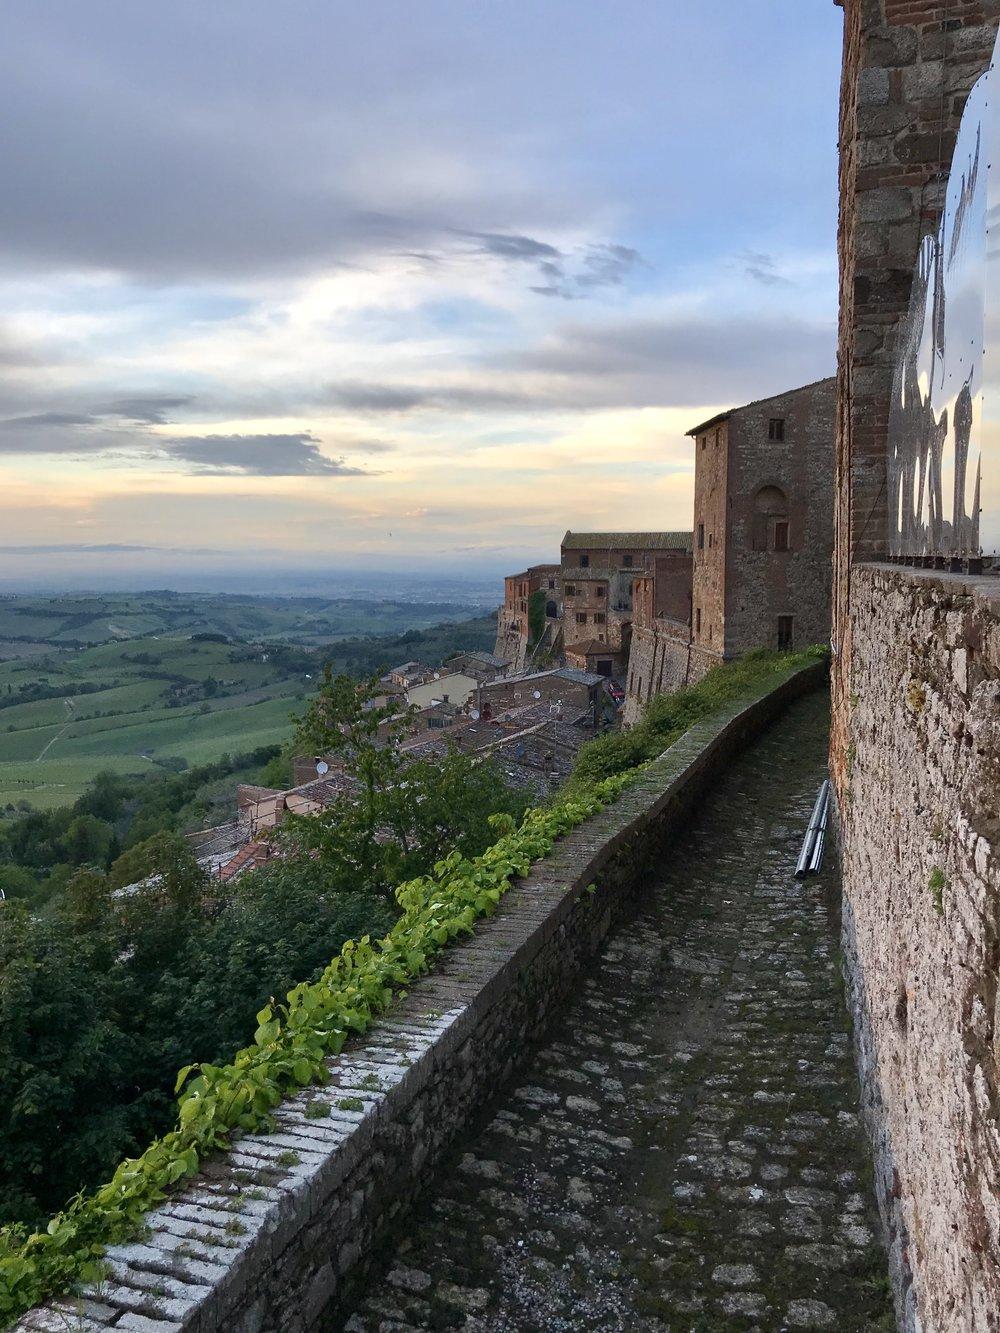 Montepulciano at sunset